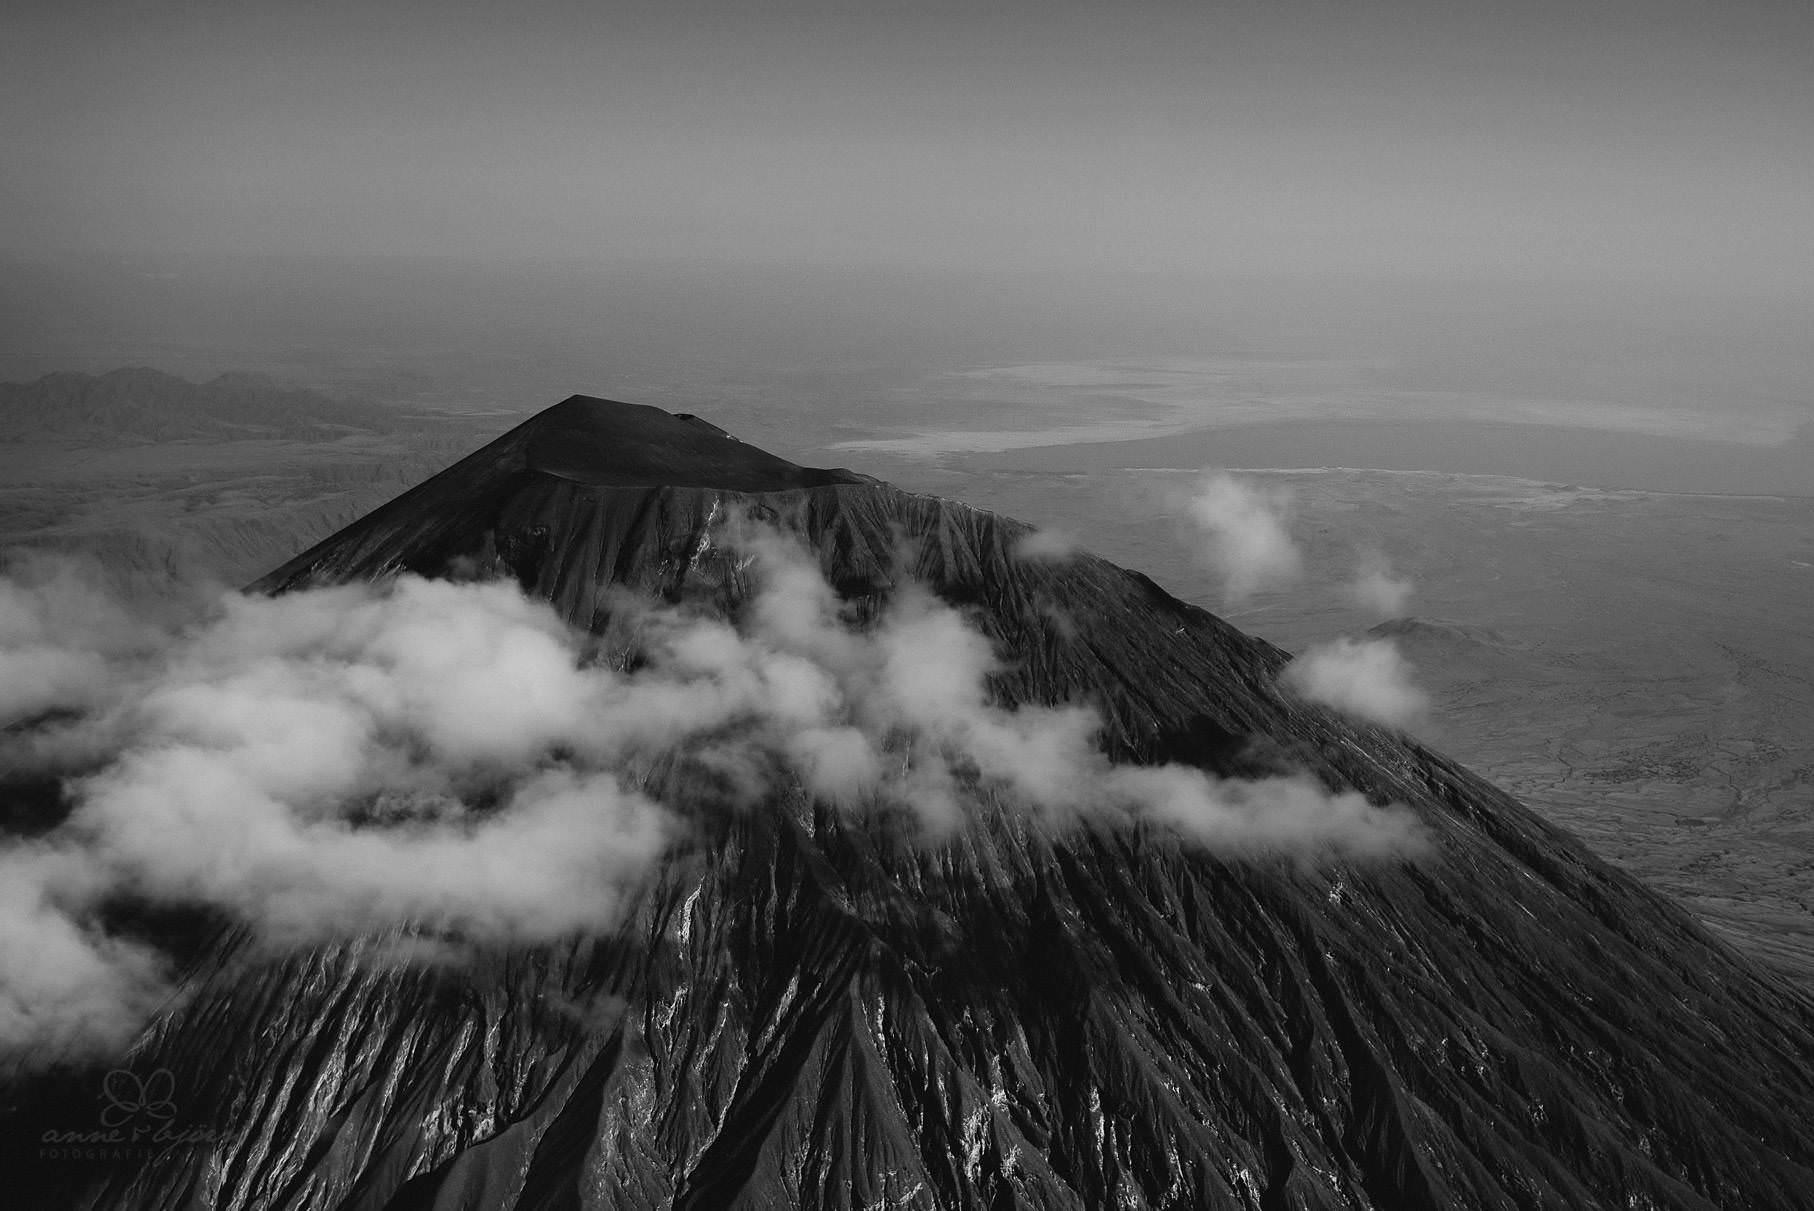 0004 tansania nd8 8294 2 anne bjoern fotografie hochzeitsfotograf hamburg - This is Tanzania - Serengeti, Kilimanjaro & Sansibar